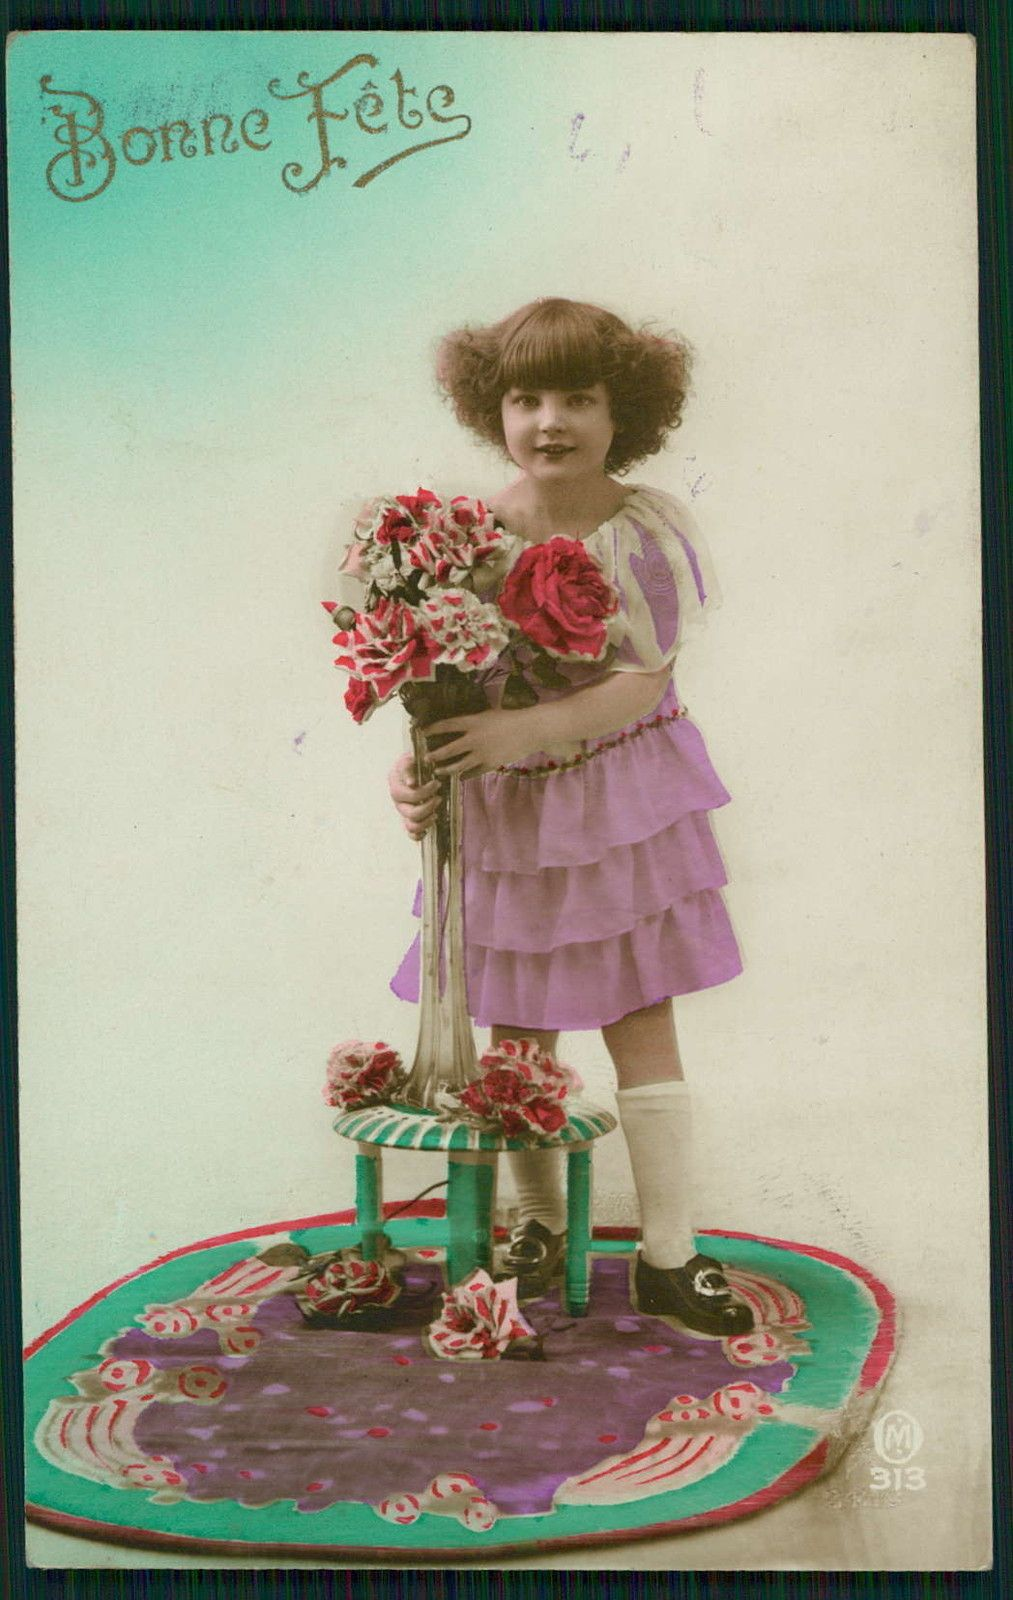 Deco Child Girl Glamour Fantasy Tinted Original Vintage 1920s Photo Postcard HT | eBay